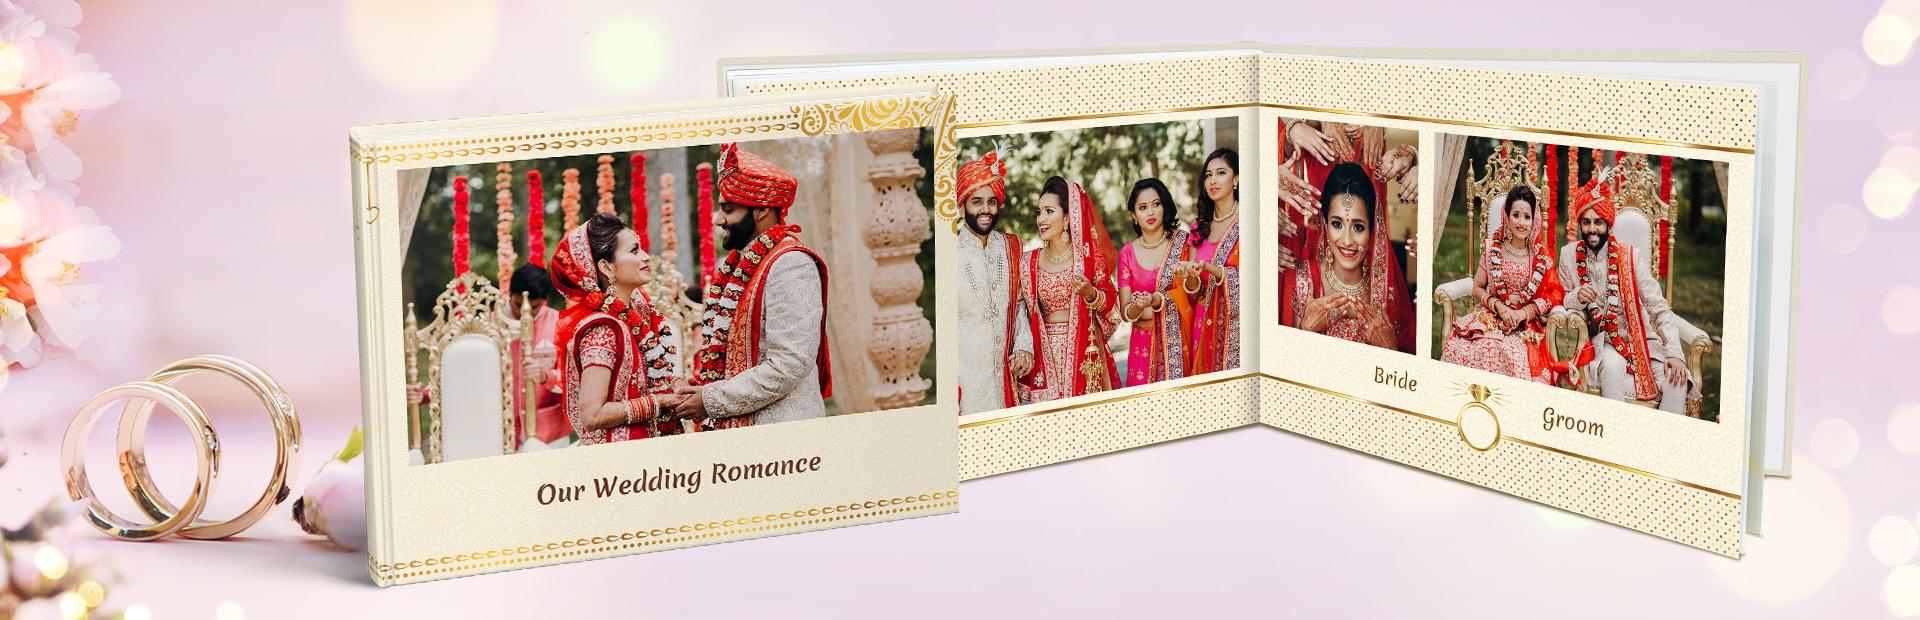 Wedding Bells Photo Books Online